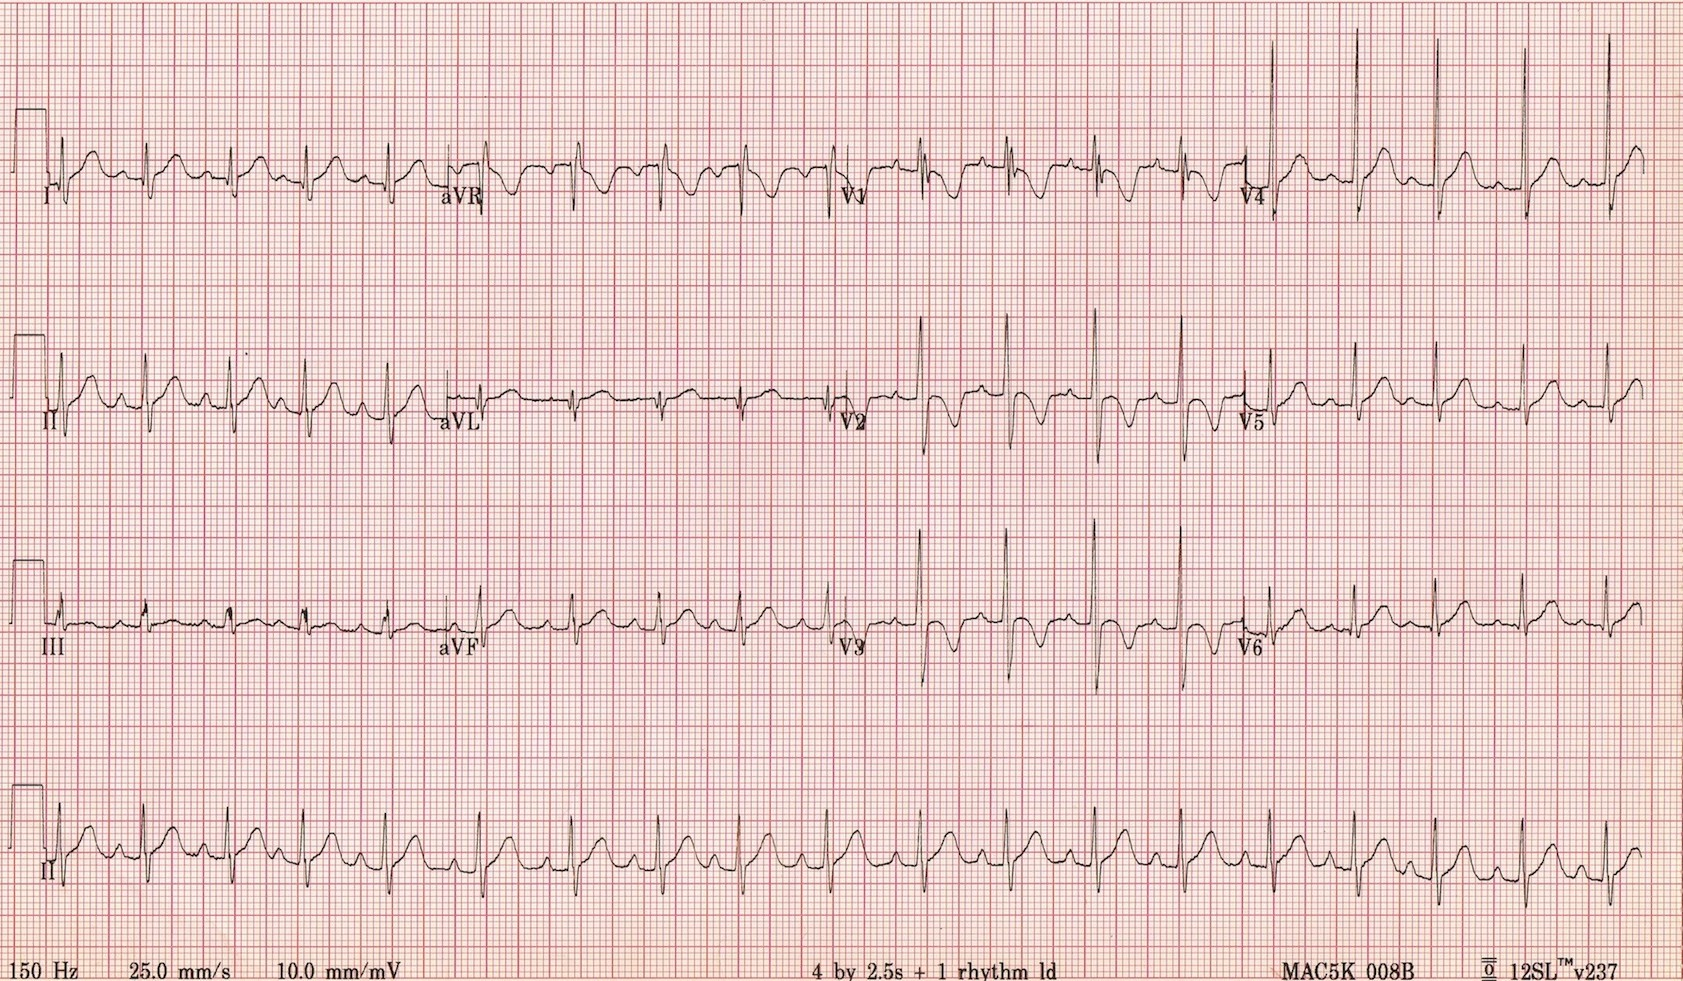 Paediatric ECG interpretation in the emergency department - EMCAGE